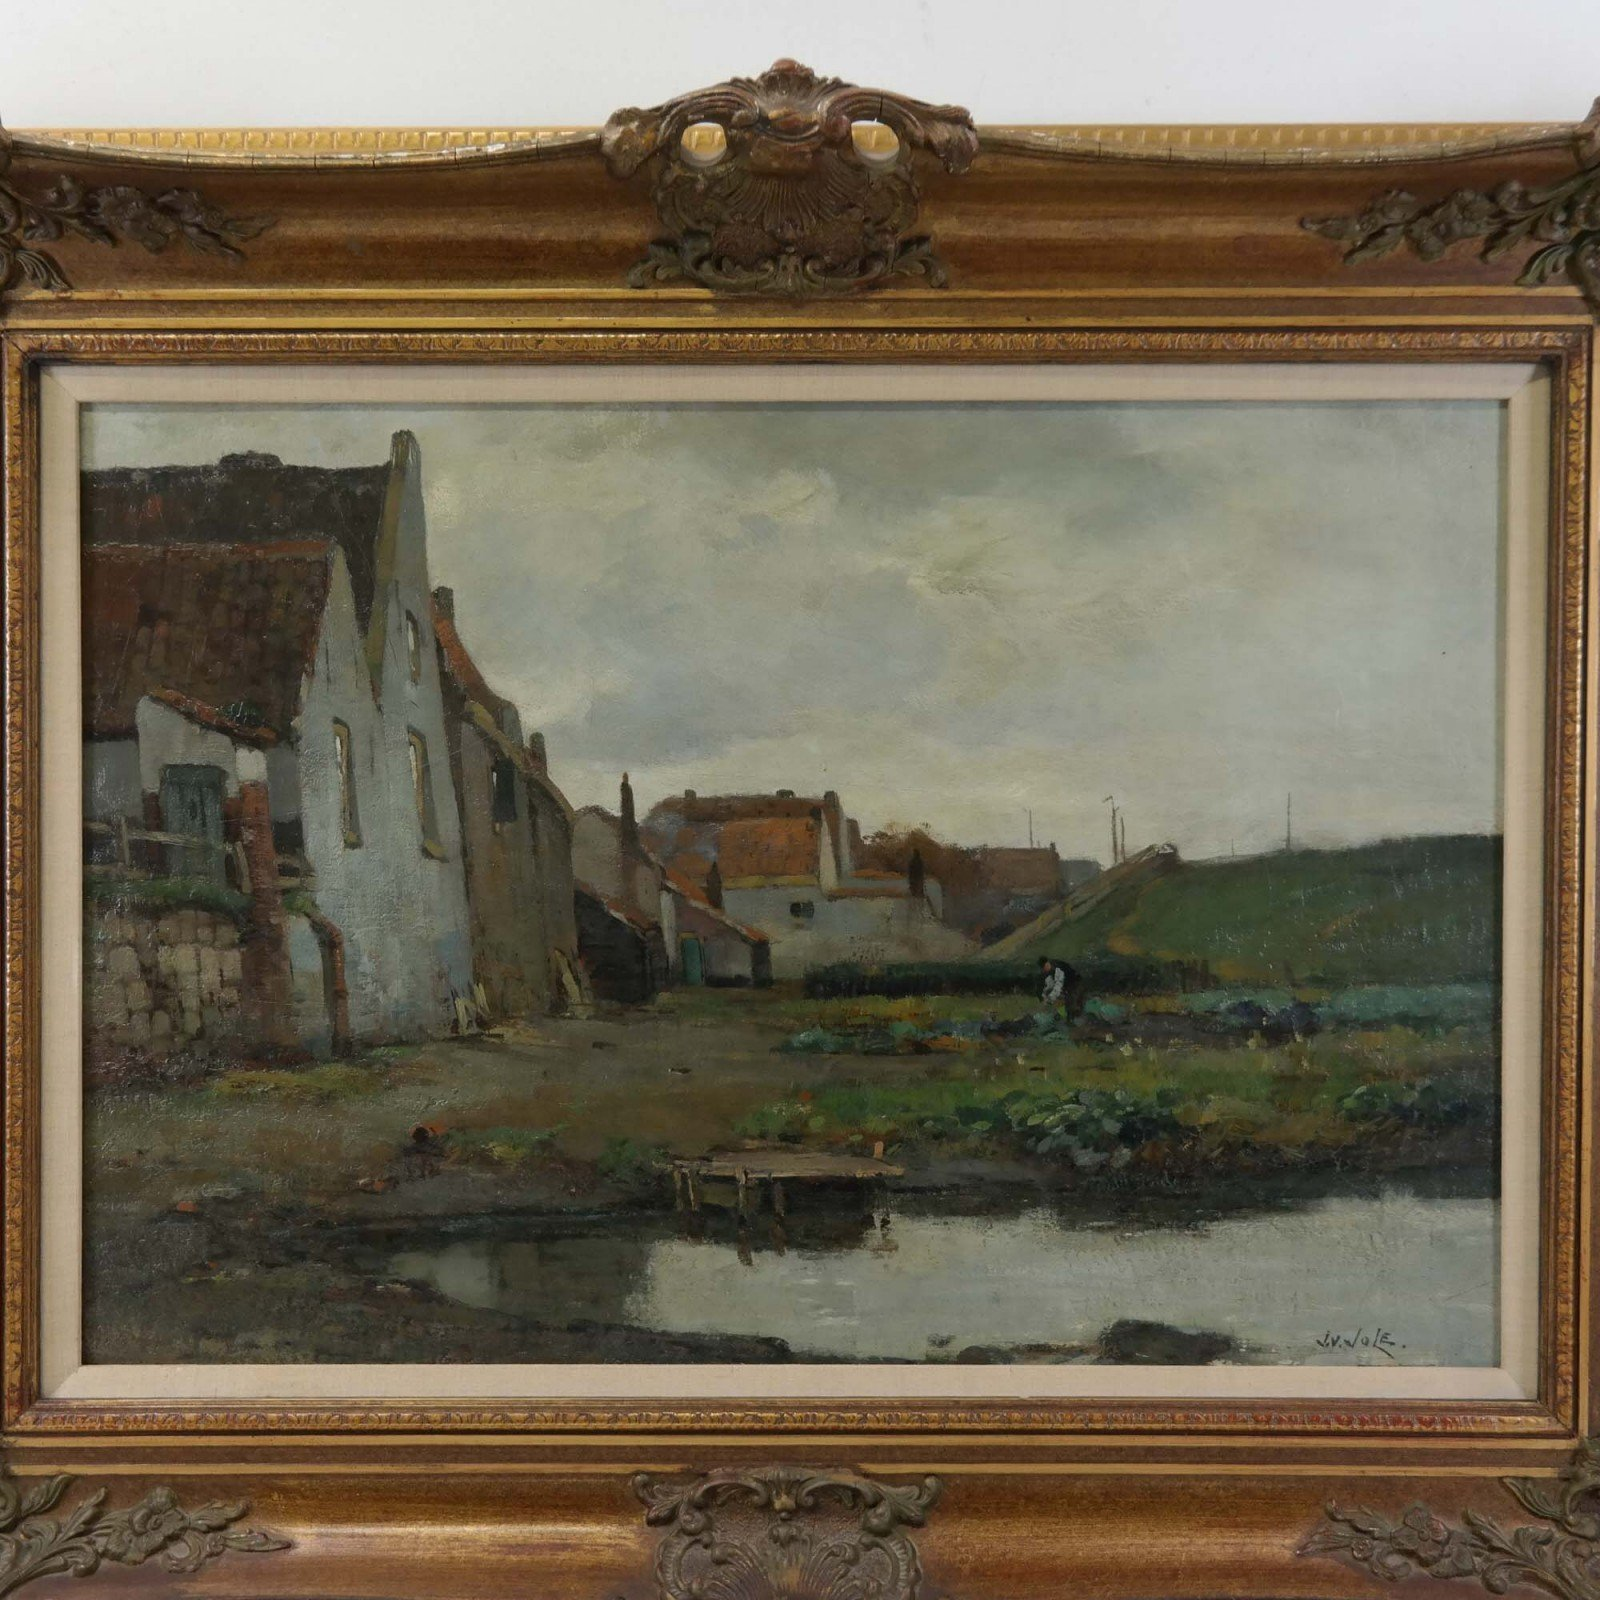 Joseph Gerardus van Jole (1877-1919)